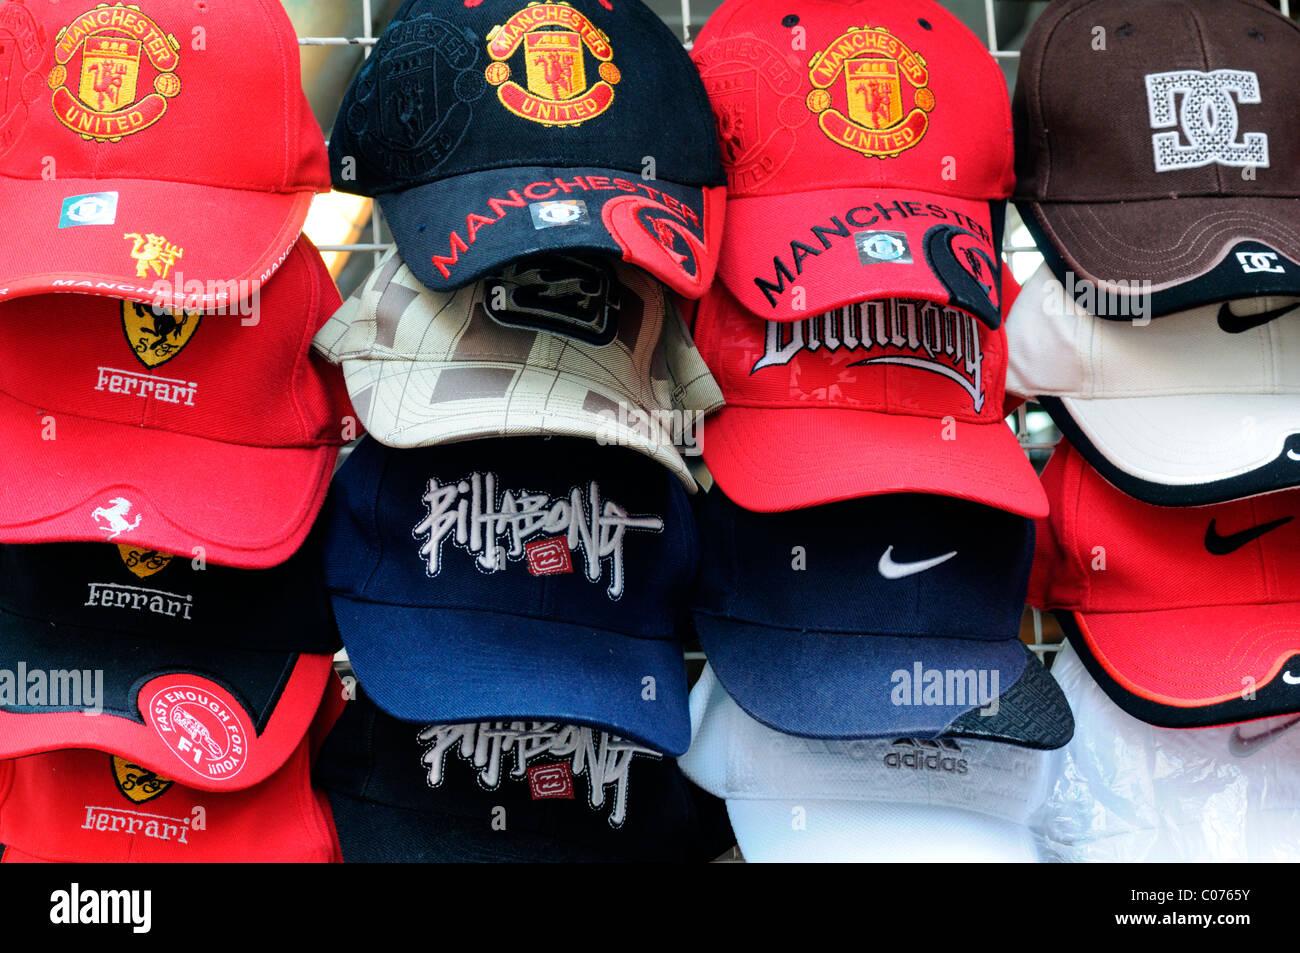 fake designer pirate pirated luxury goods on sale stall petaling street  chinatown kuala lumpur malaysia manchester 789548165d58